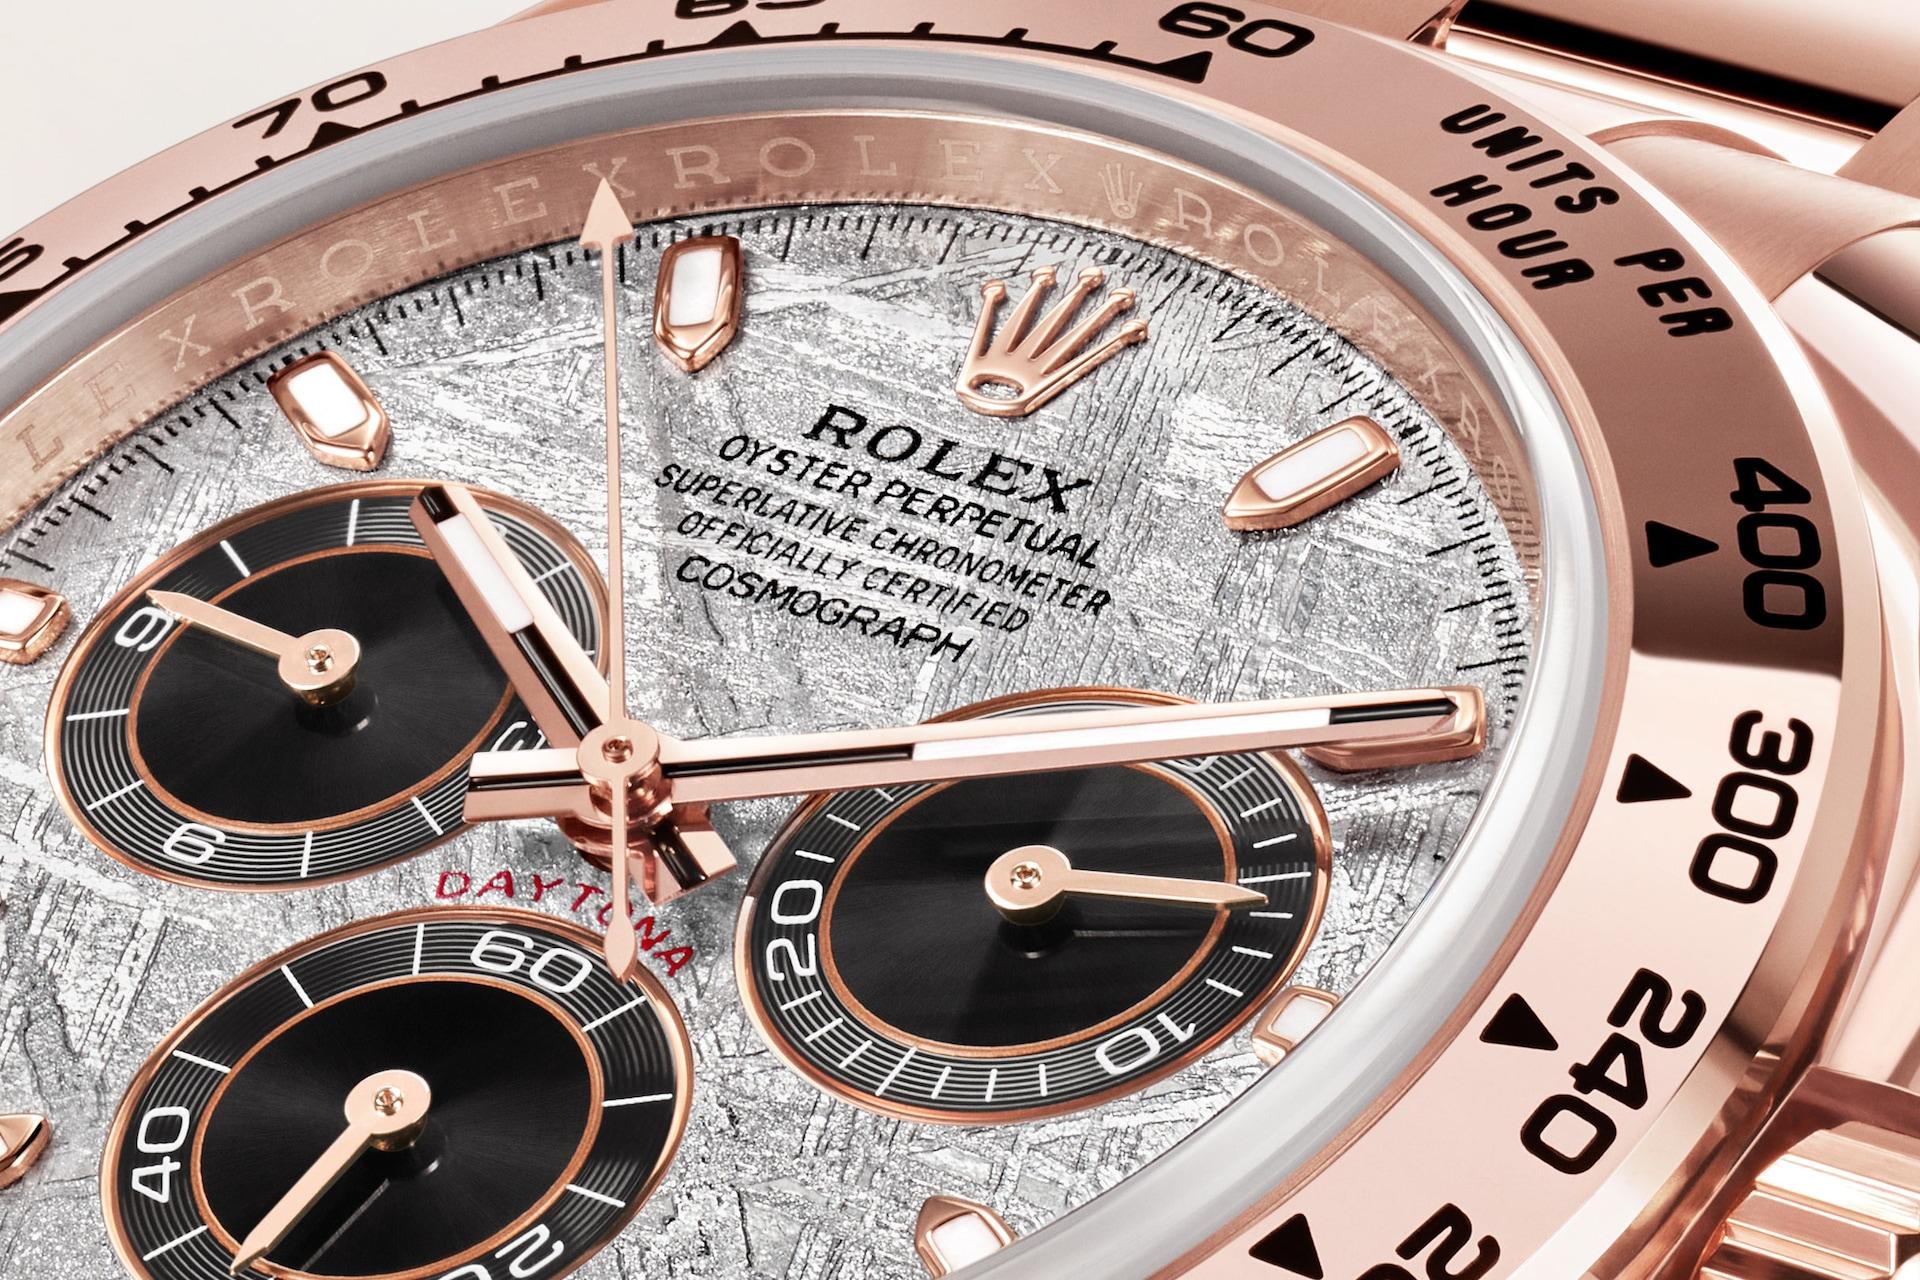 Rolex Cosmograph Daytona 116505 Detalle esfera